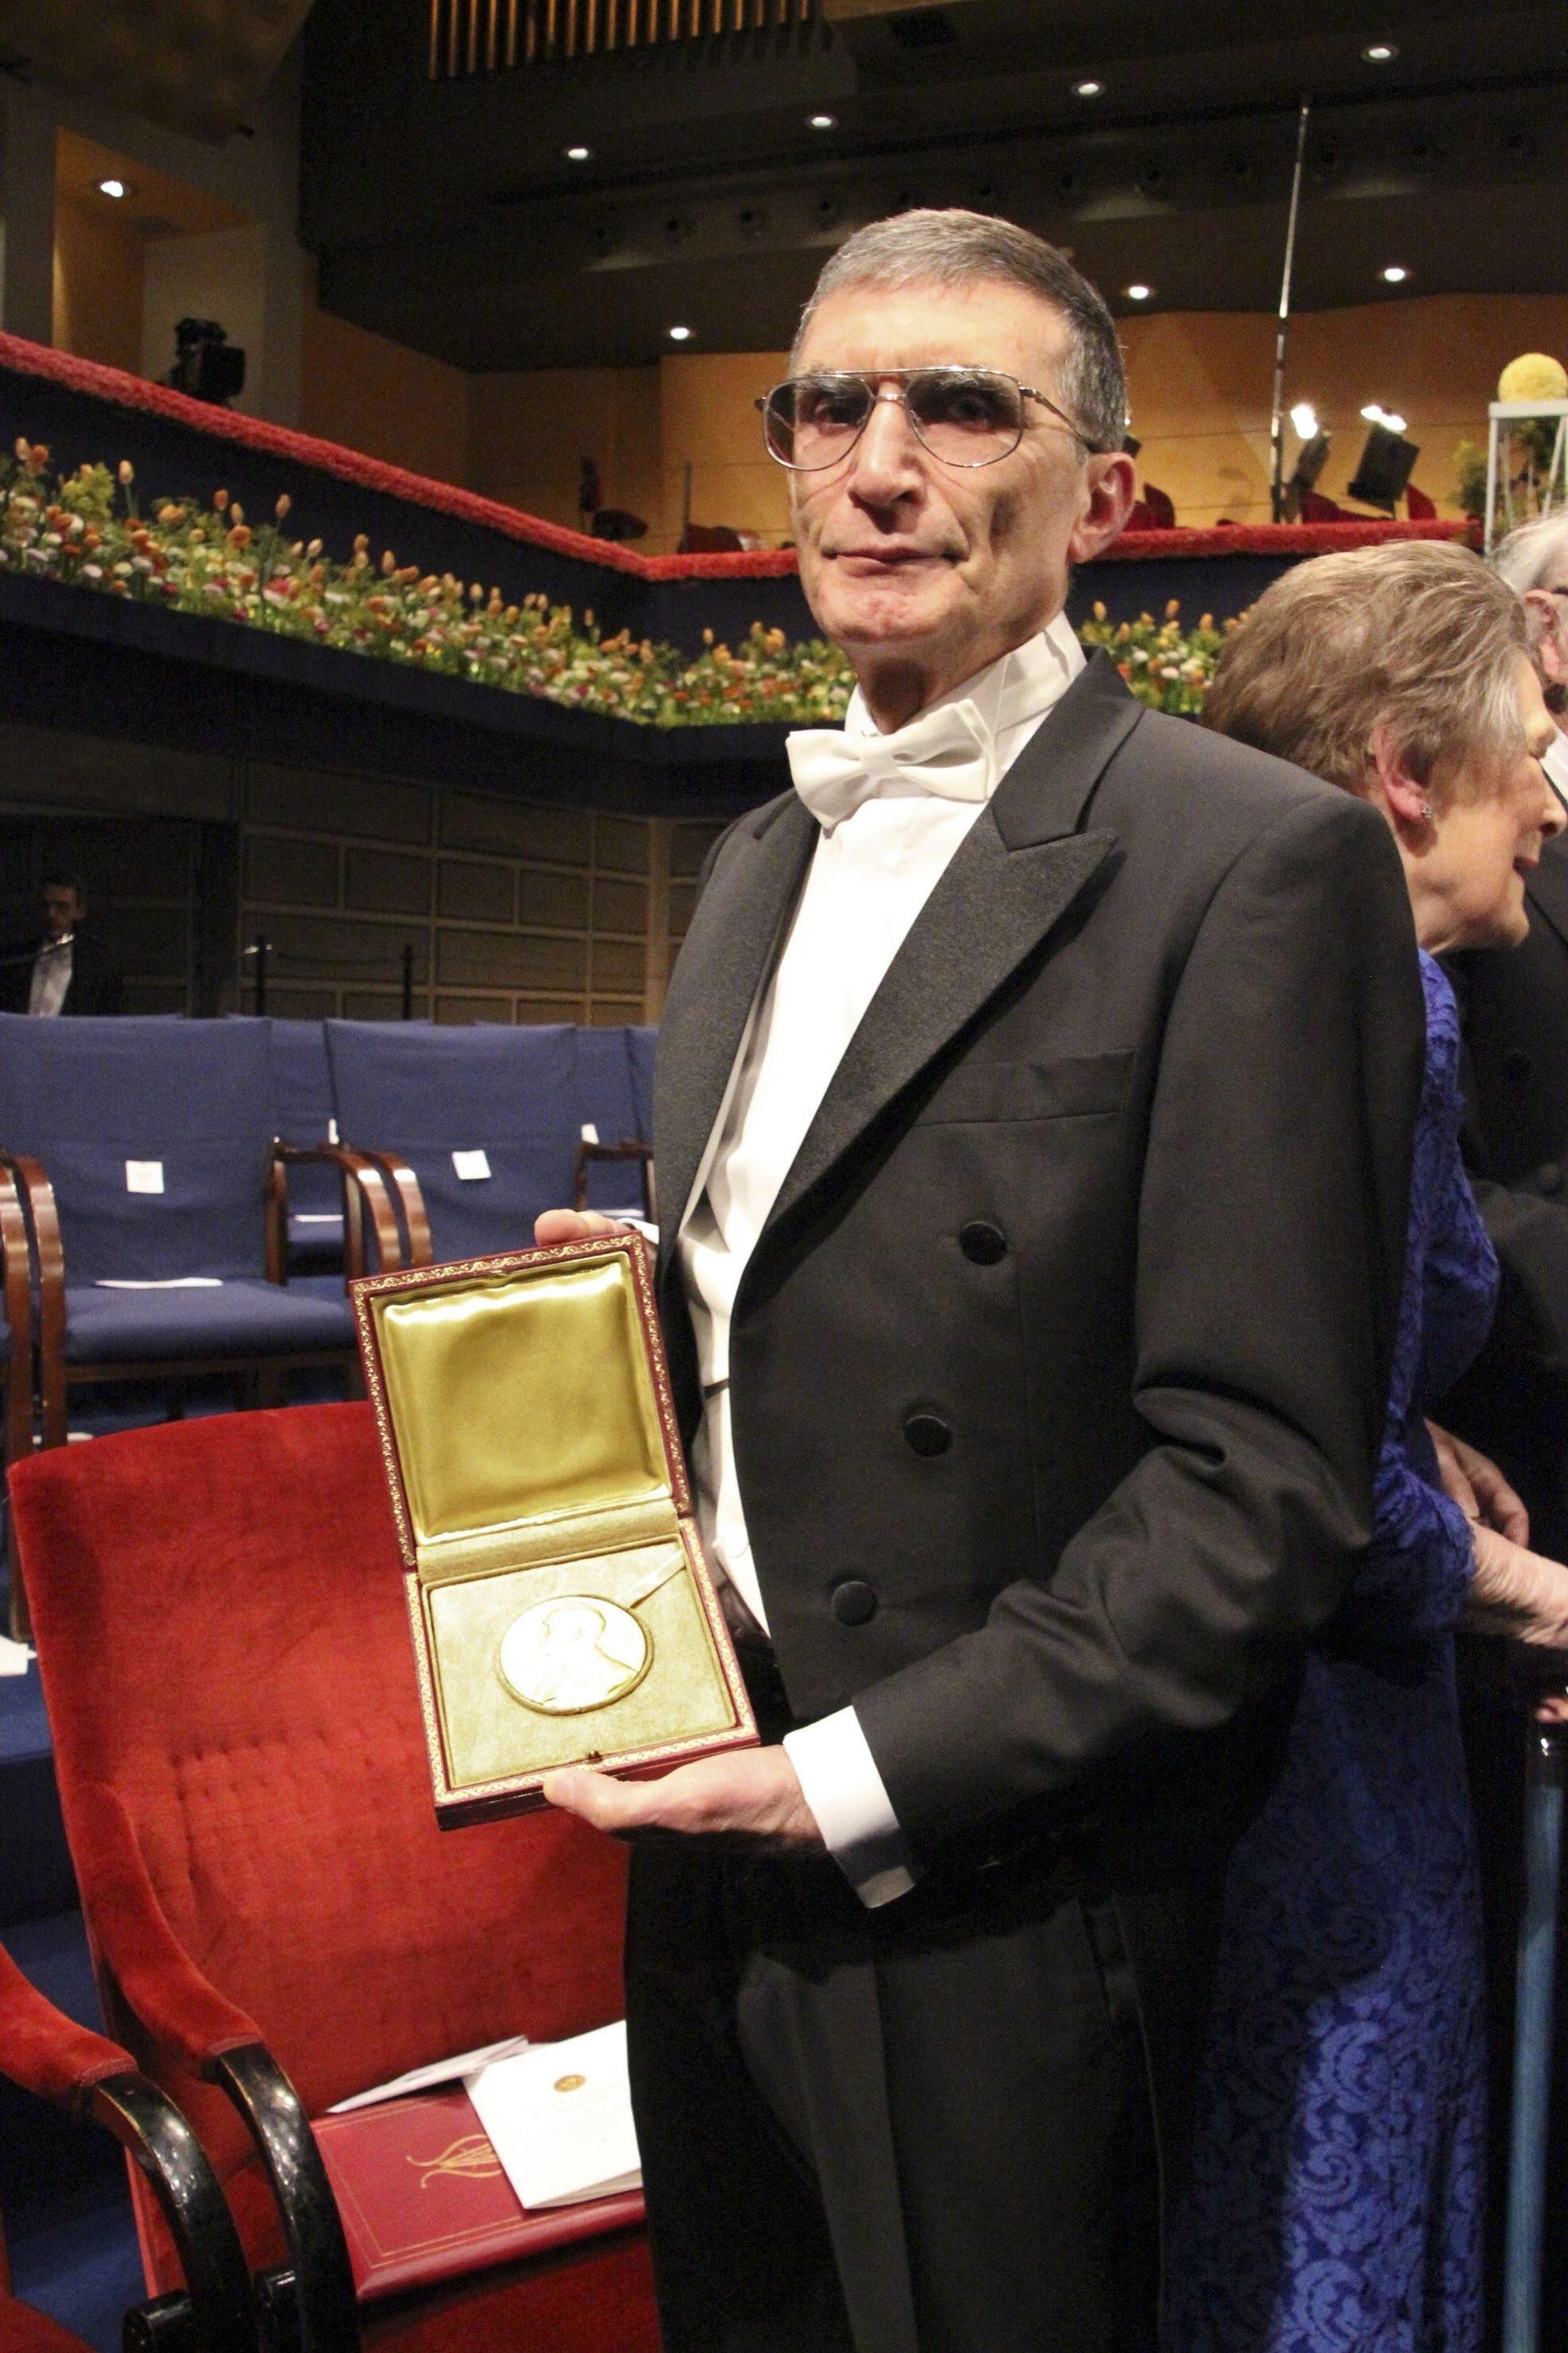 Aziz Sancar poses with his Nobel medal at the Stockholm Concert Hall, Stockholm, Sweden, Dec. 10, 2015. (Archive Photo)